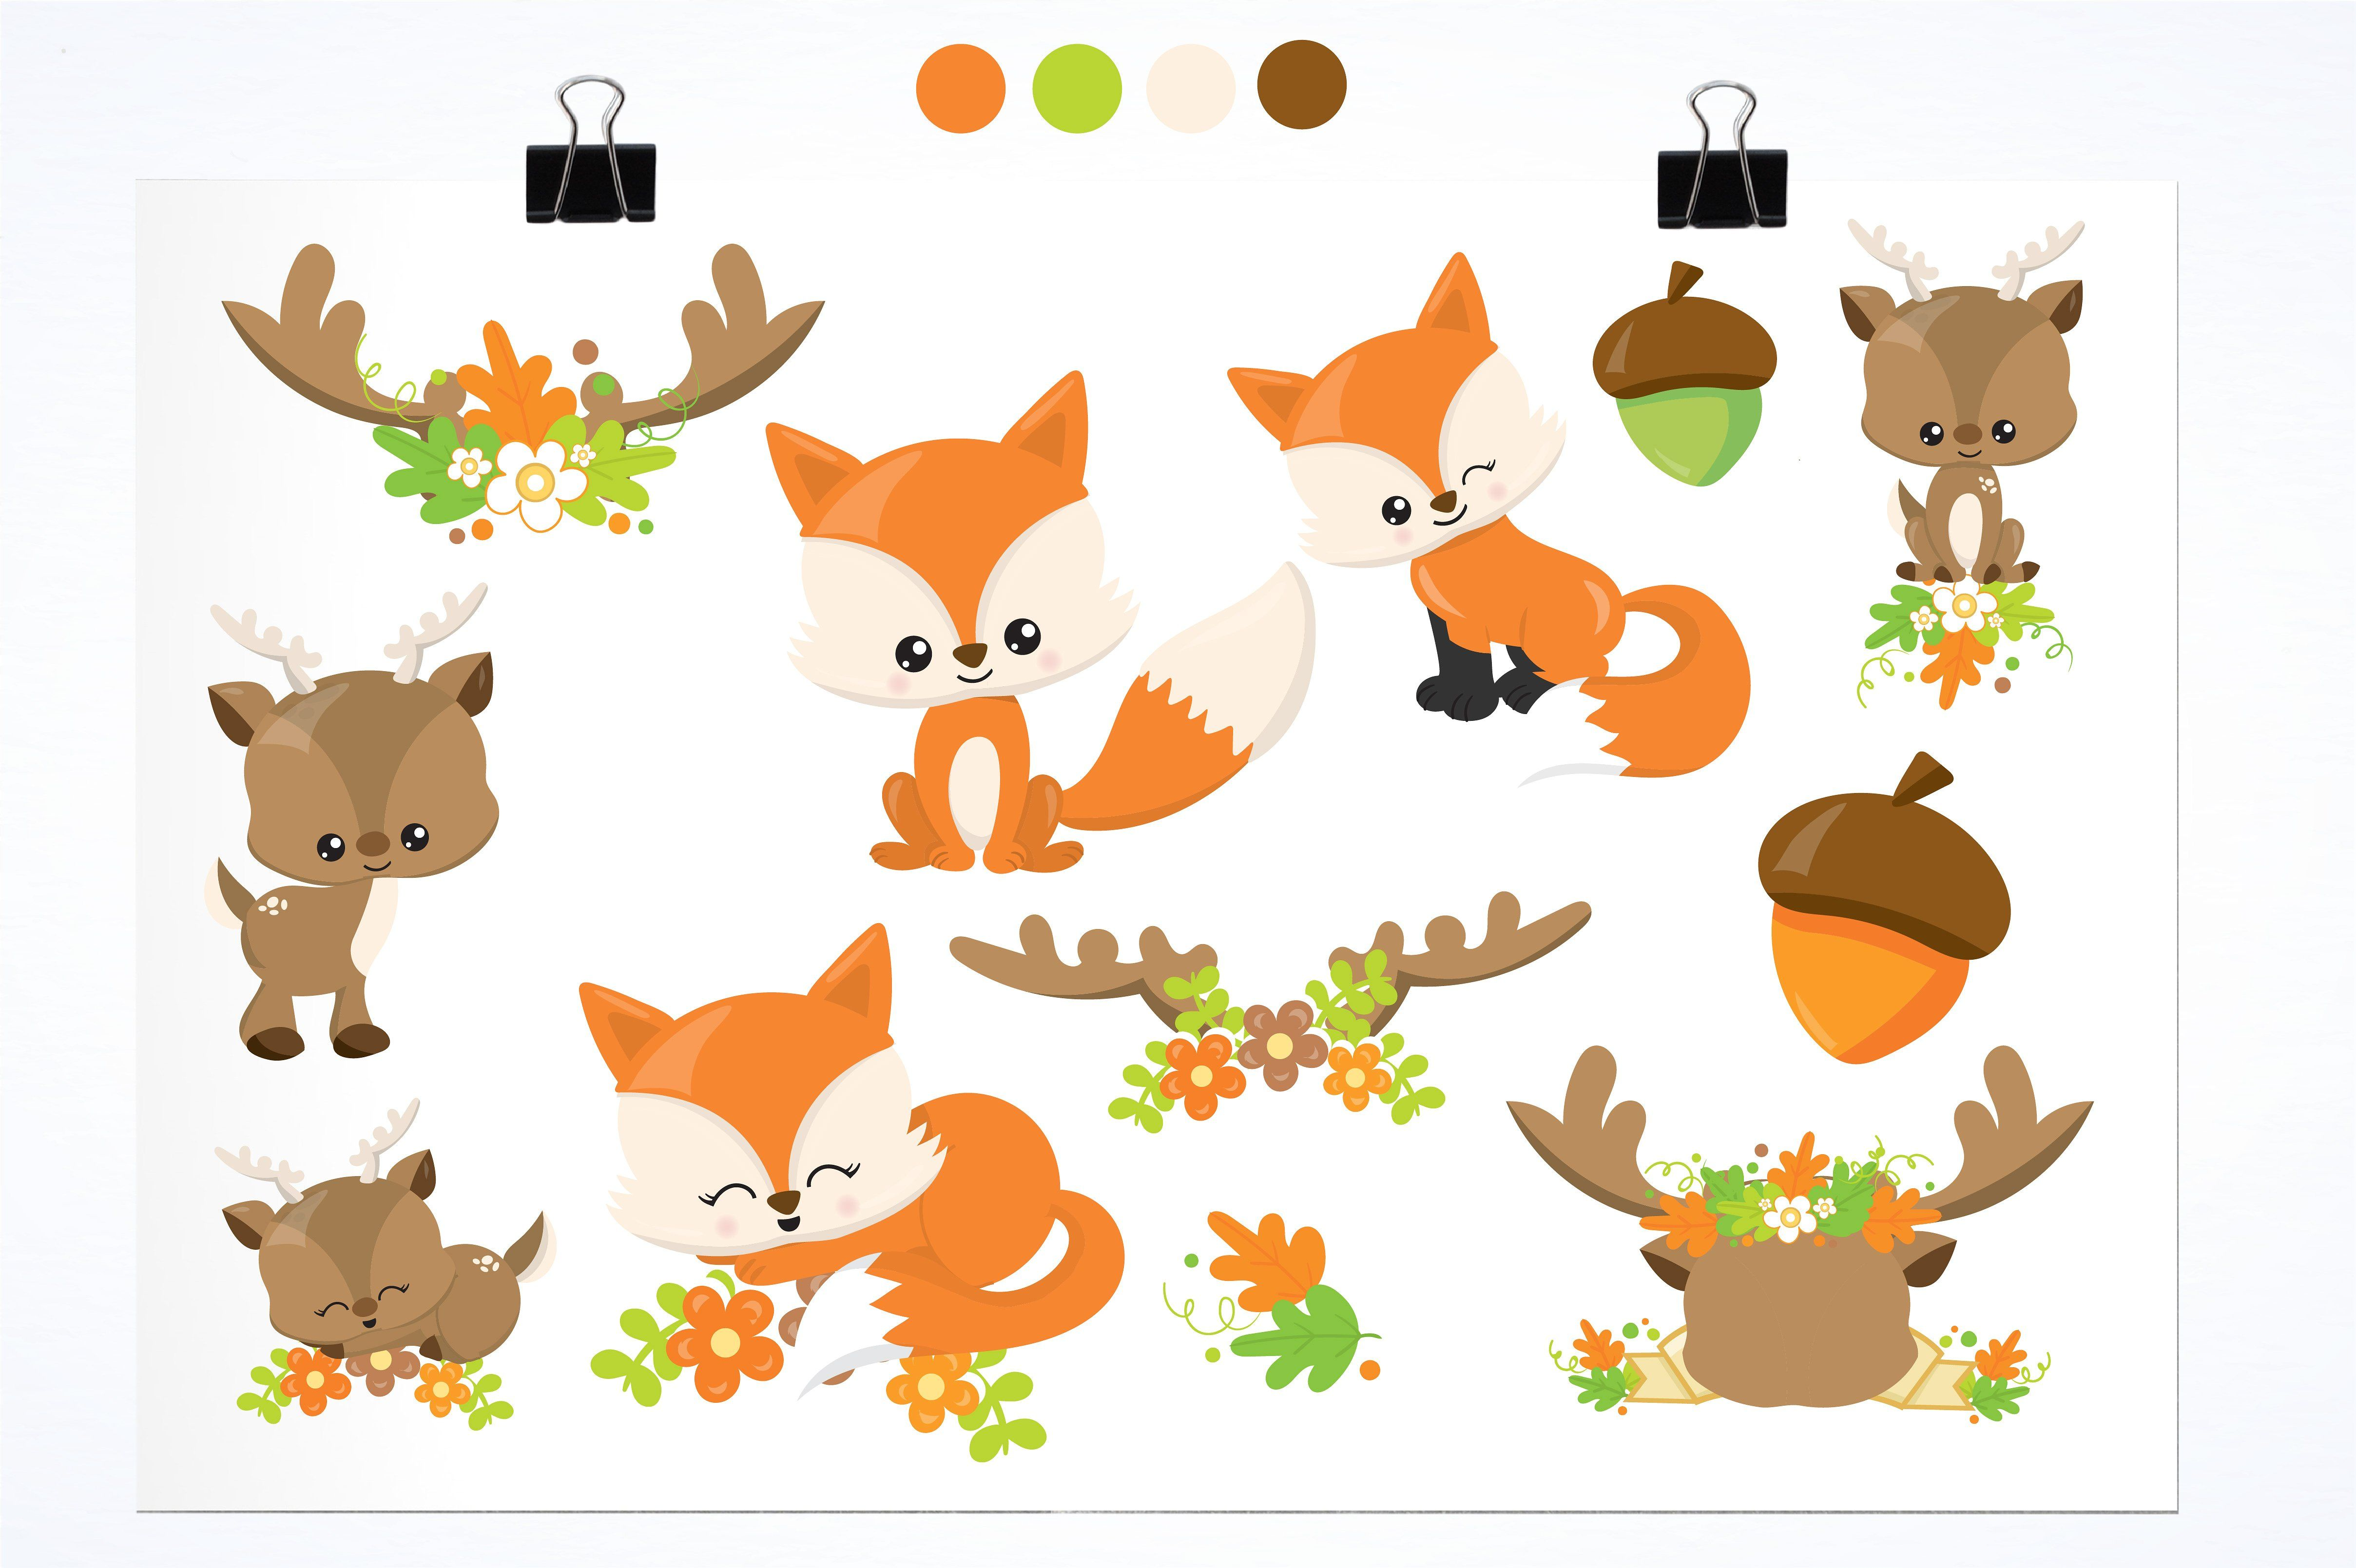 Spring Animals Illustration Pack Spring Animals Cute Animal Clipart Animal Illustration